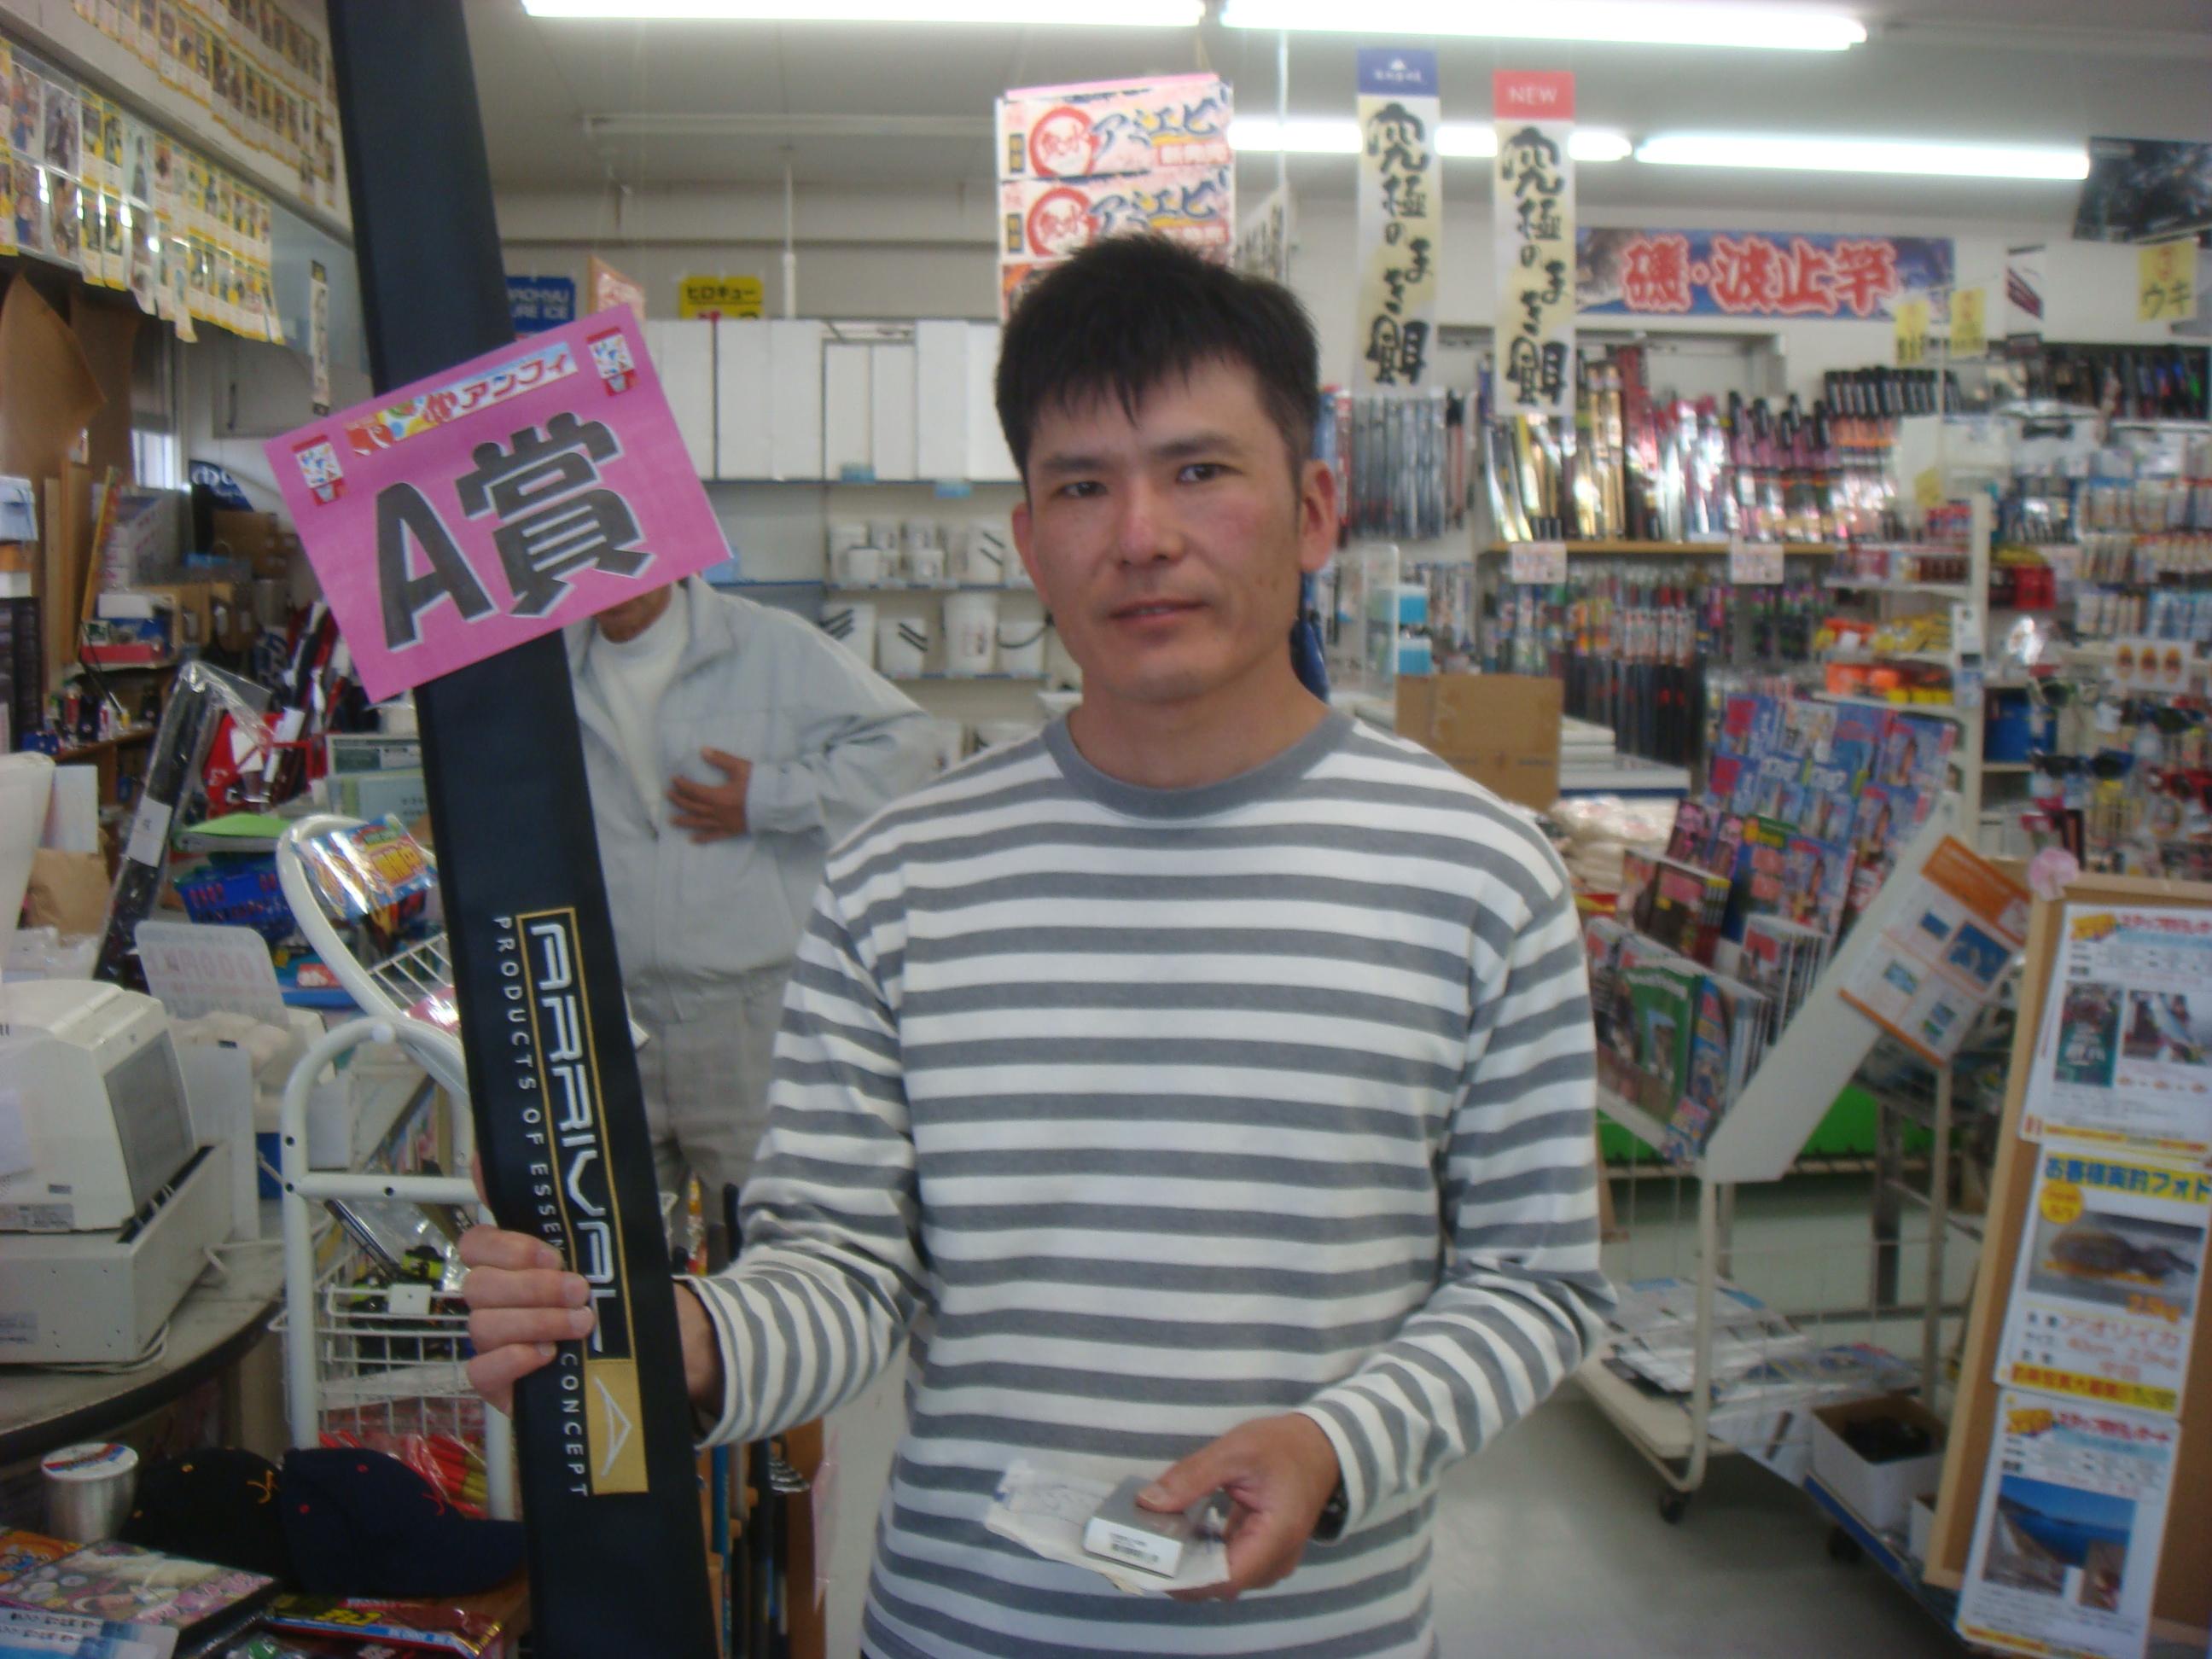 http://www.e-angle.co.jp/shop/news/DSC02993.JPG